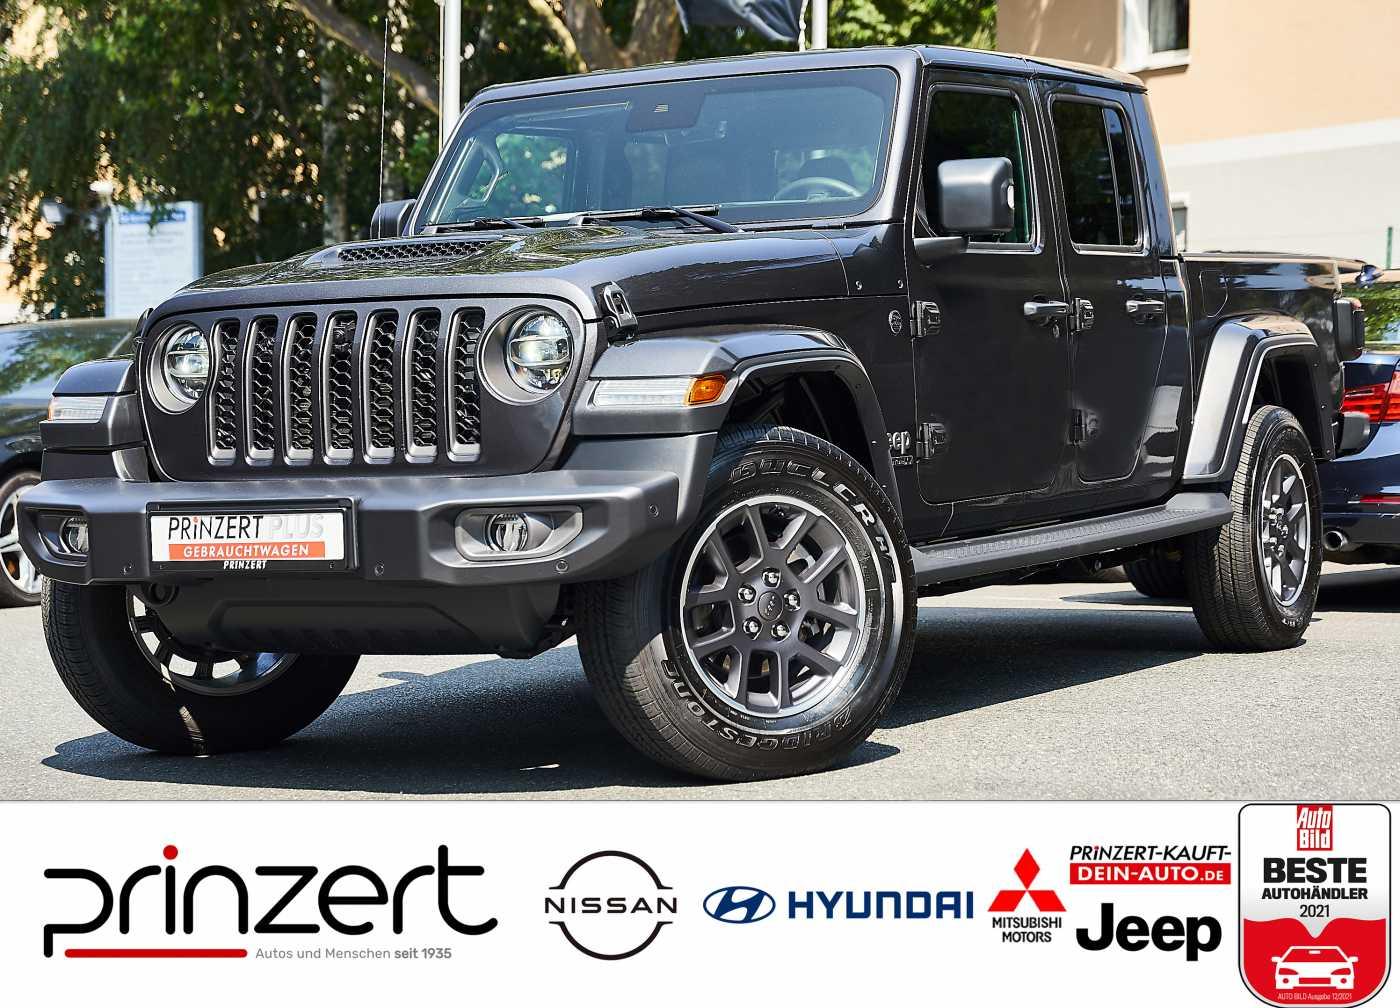 Jeep Gladiator 3.0 V6 4x4 AT Overland, Jahr 2021, Diesel